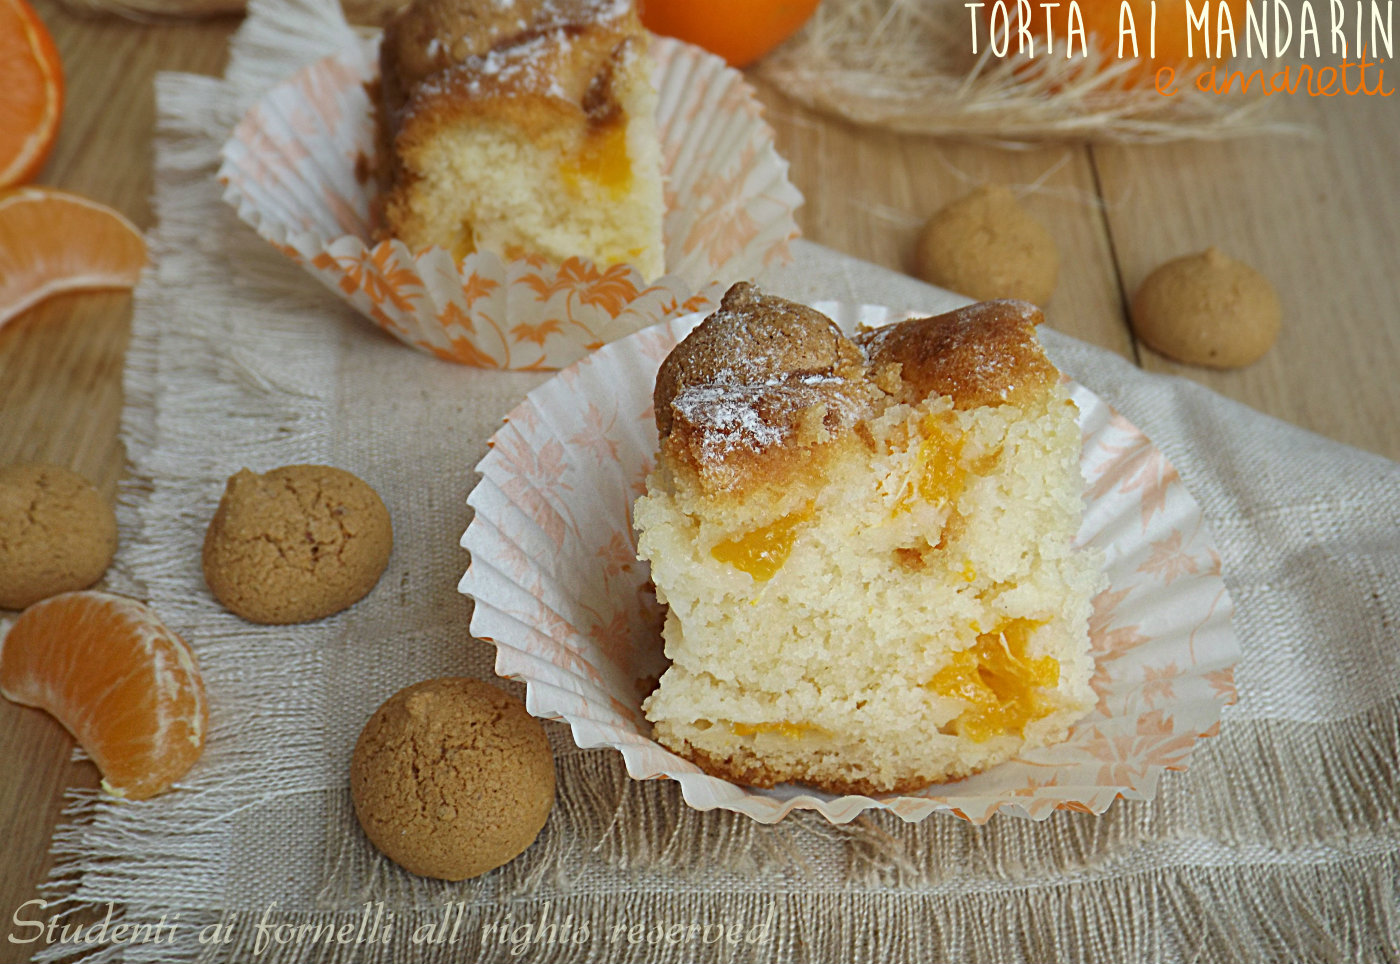 torta ai mandarini e-amaretti-morbida-ricetta-torta-golosa